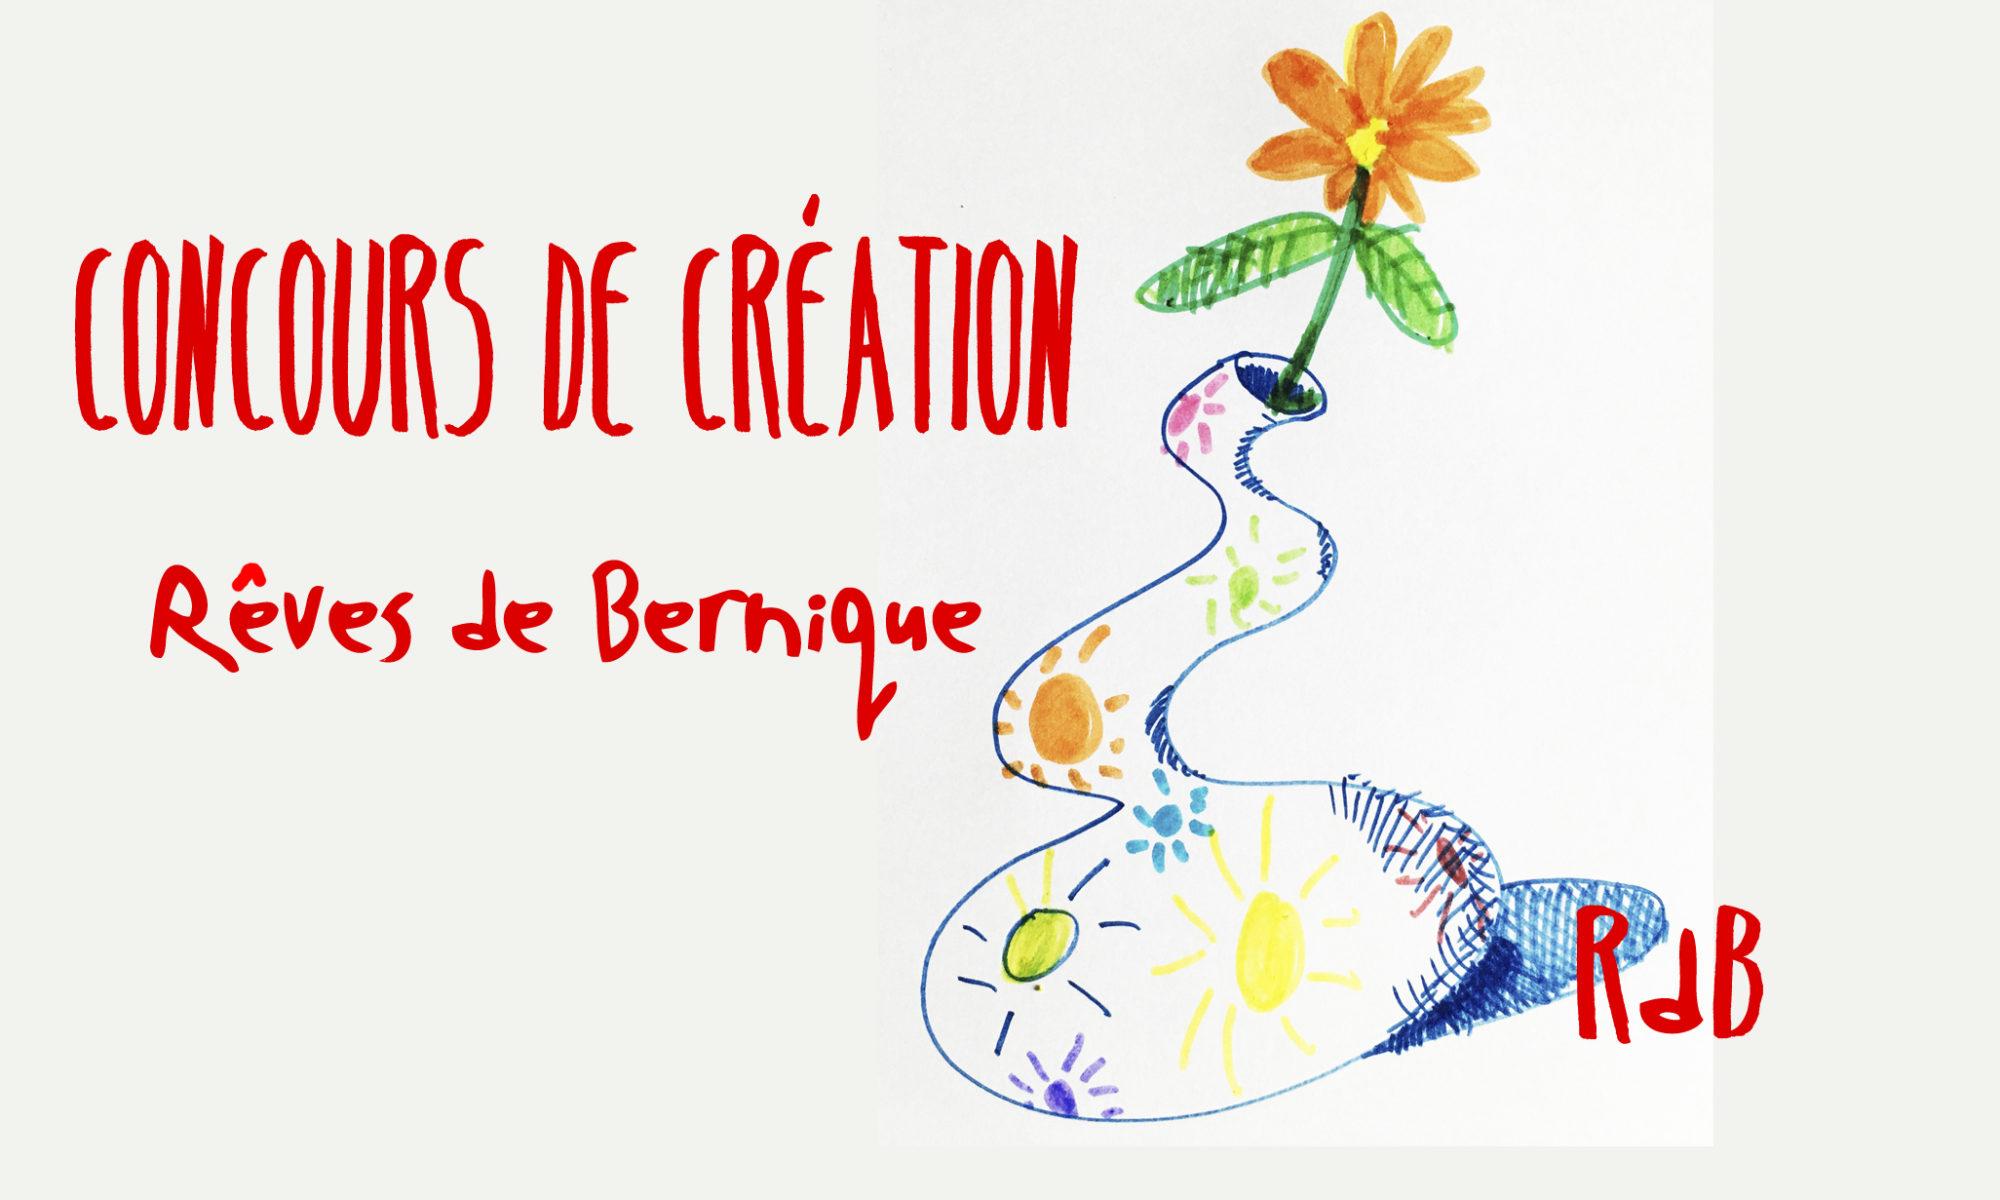 concours creation design decoration bretagne